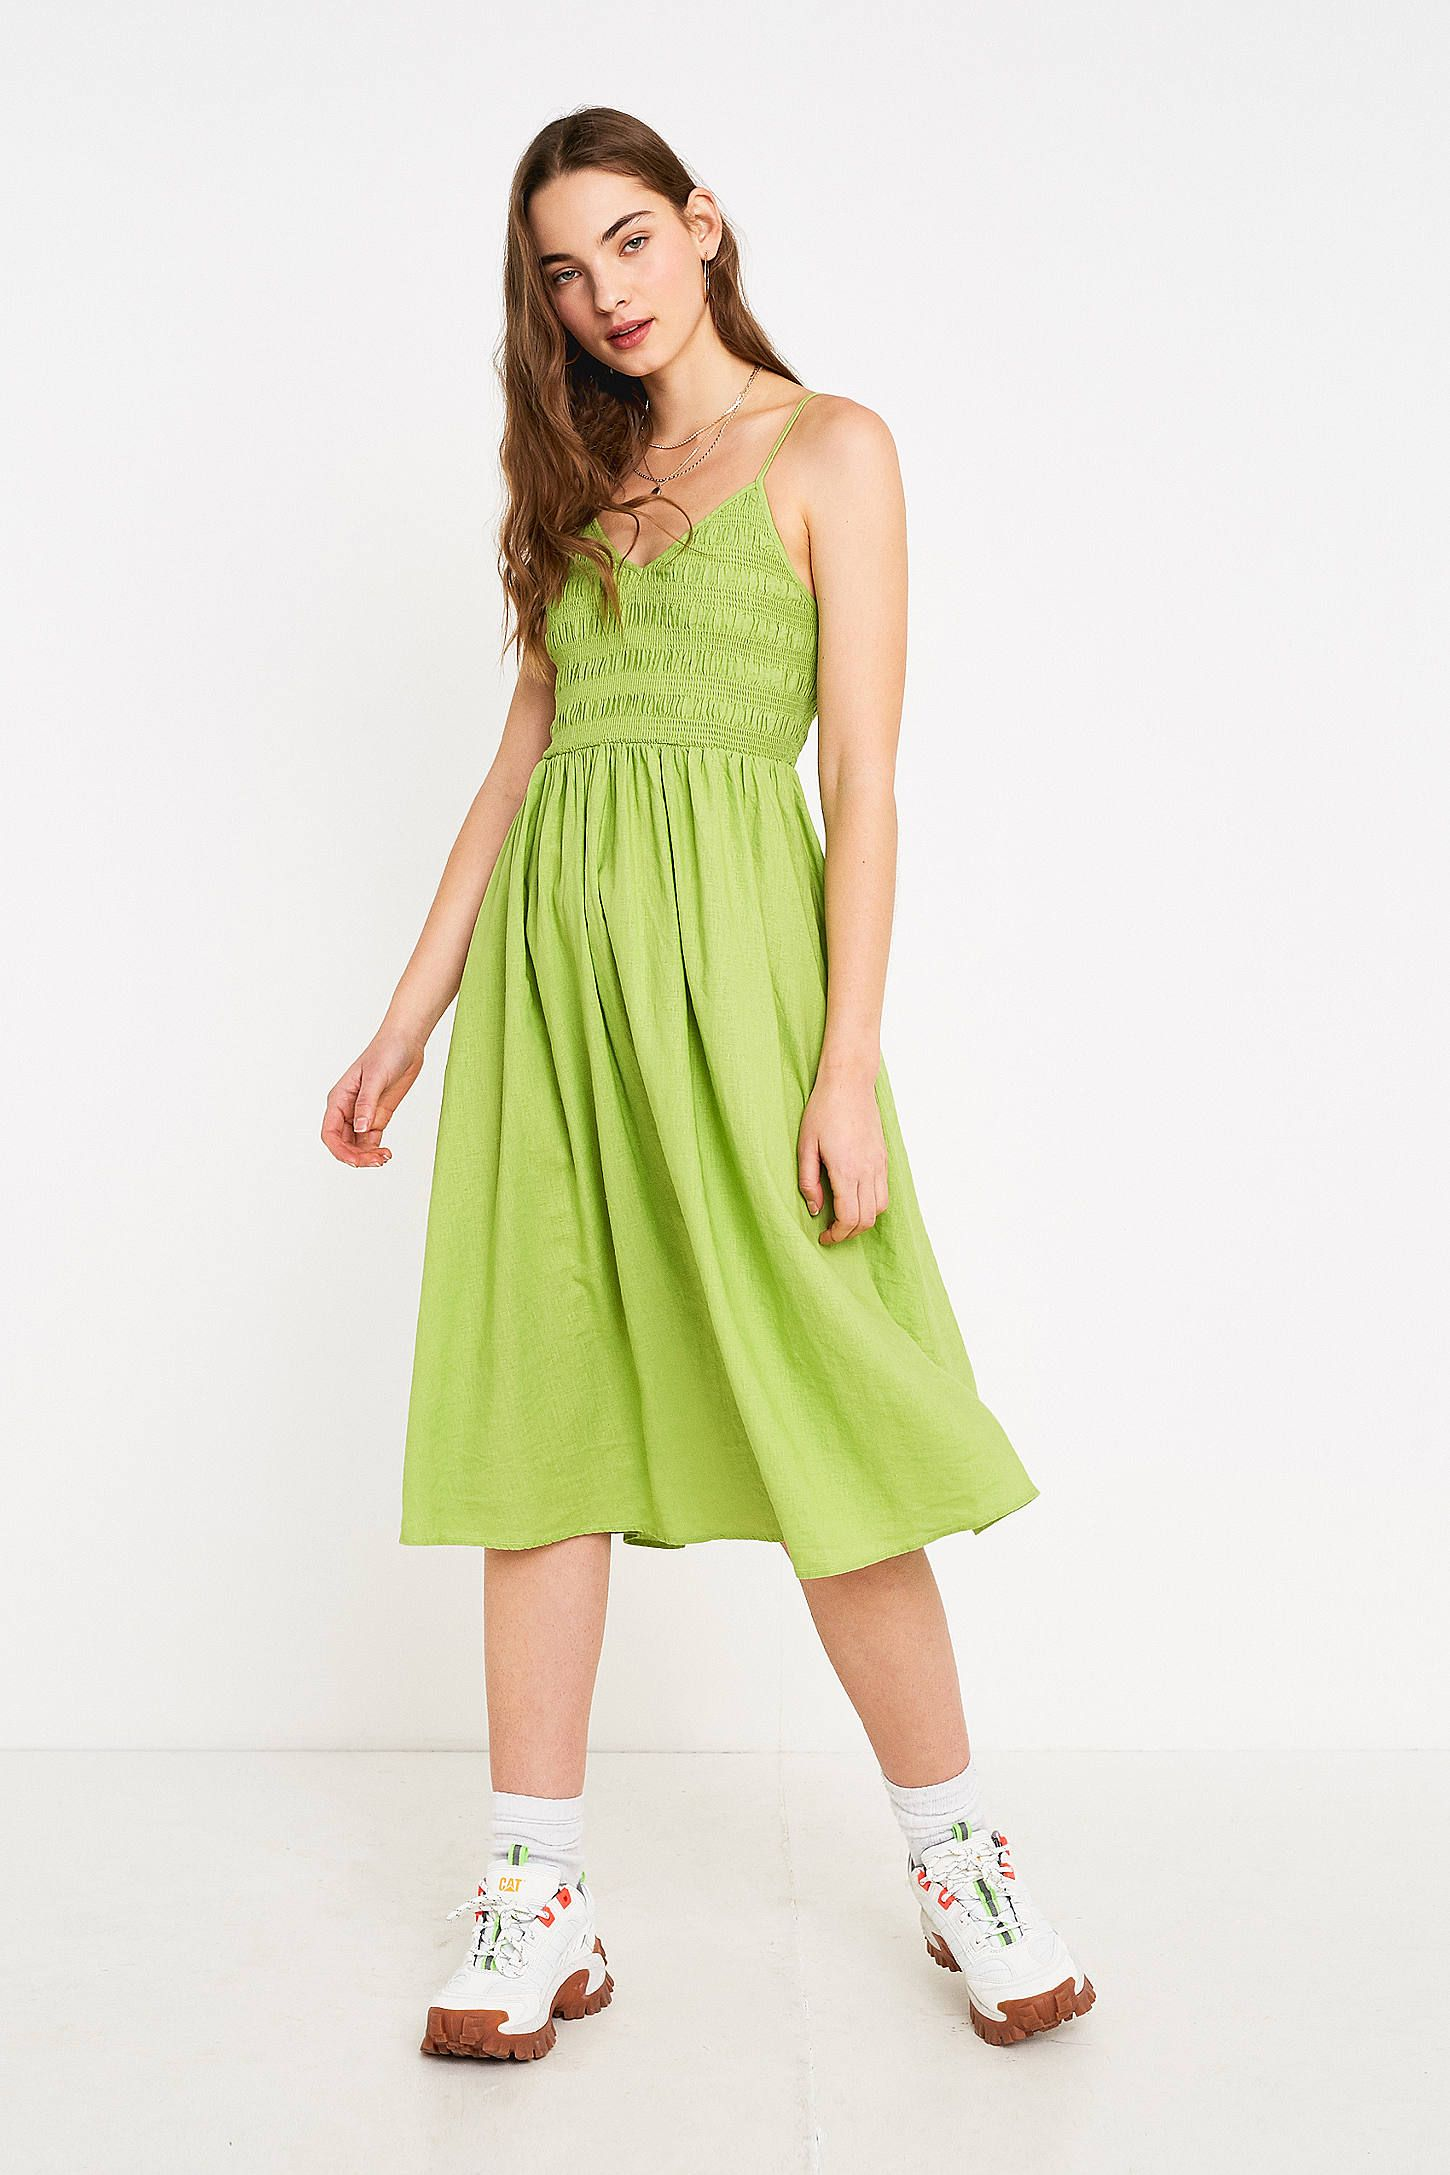 864a4e61c95e UO Ember Lime Smocked Midi Dress in 2019 | Dresses | Dresses ...